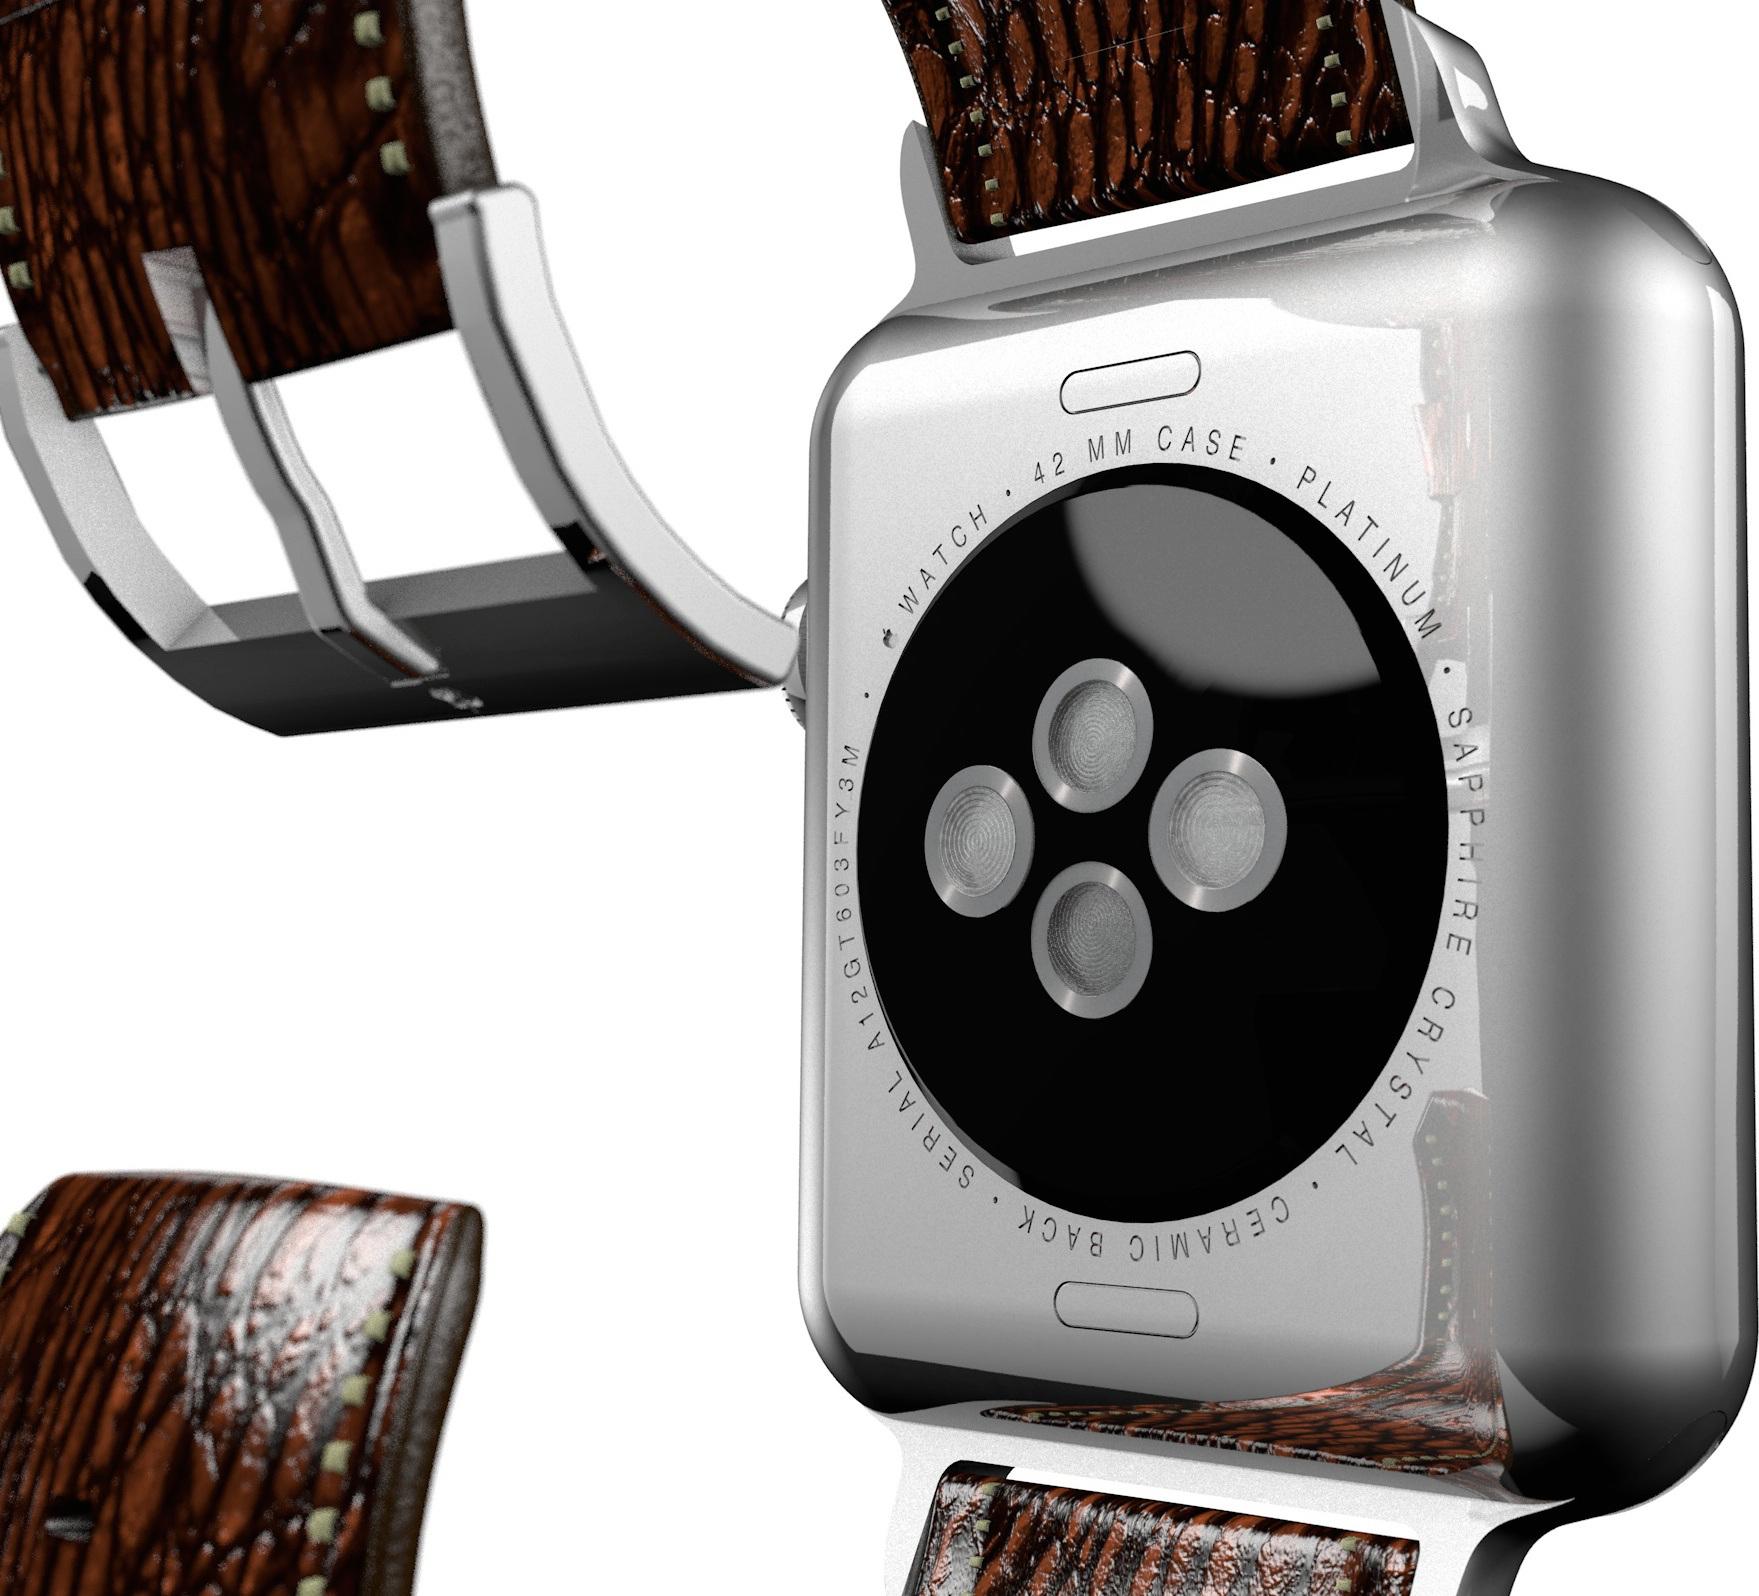 Apple Watch 2 concept by ADR Studios